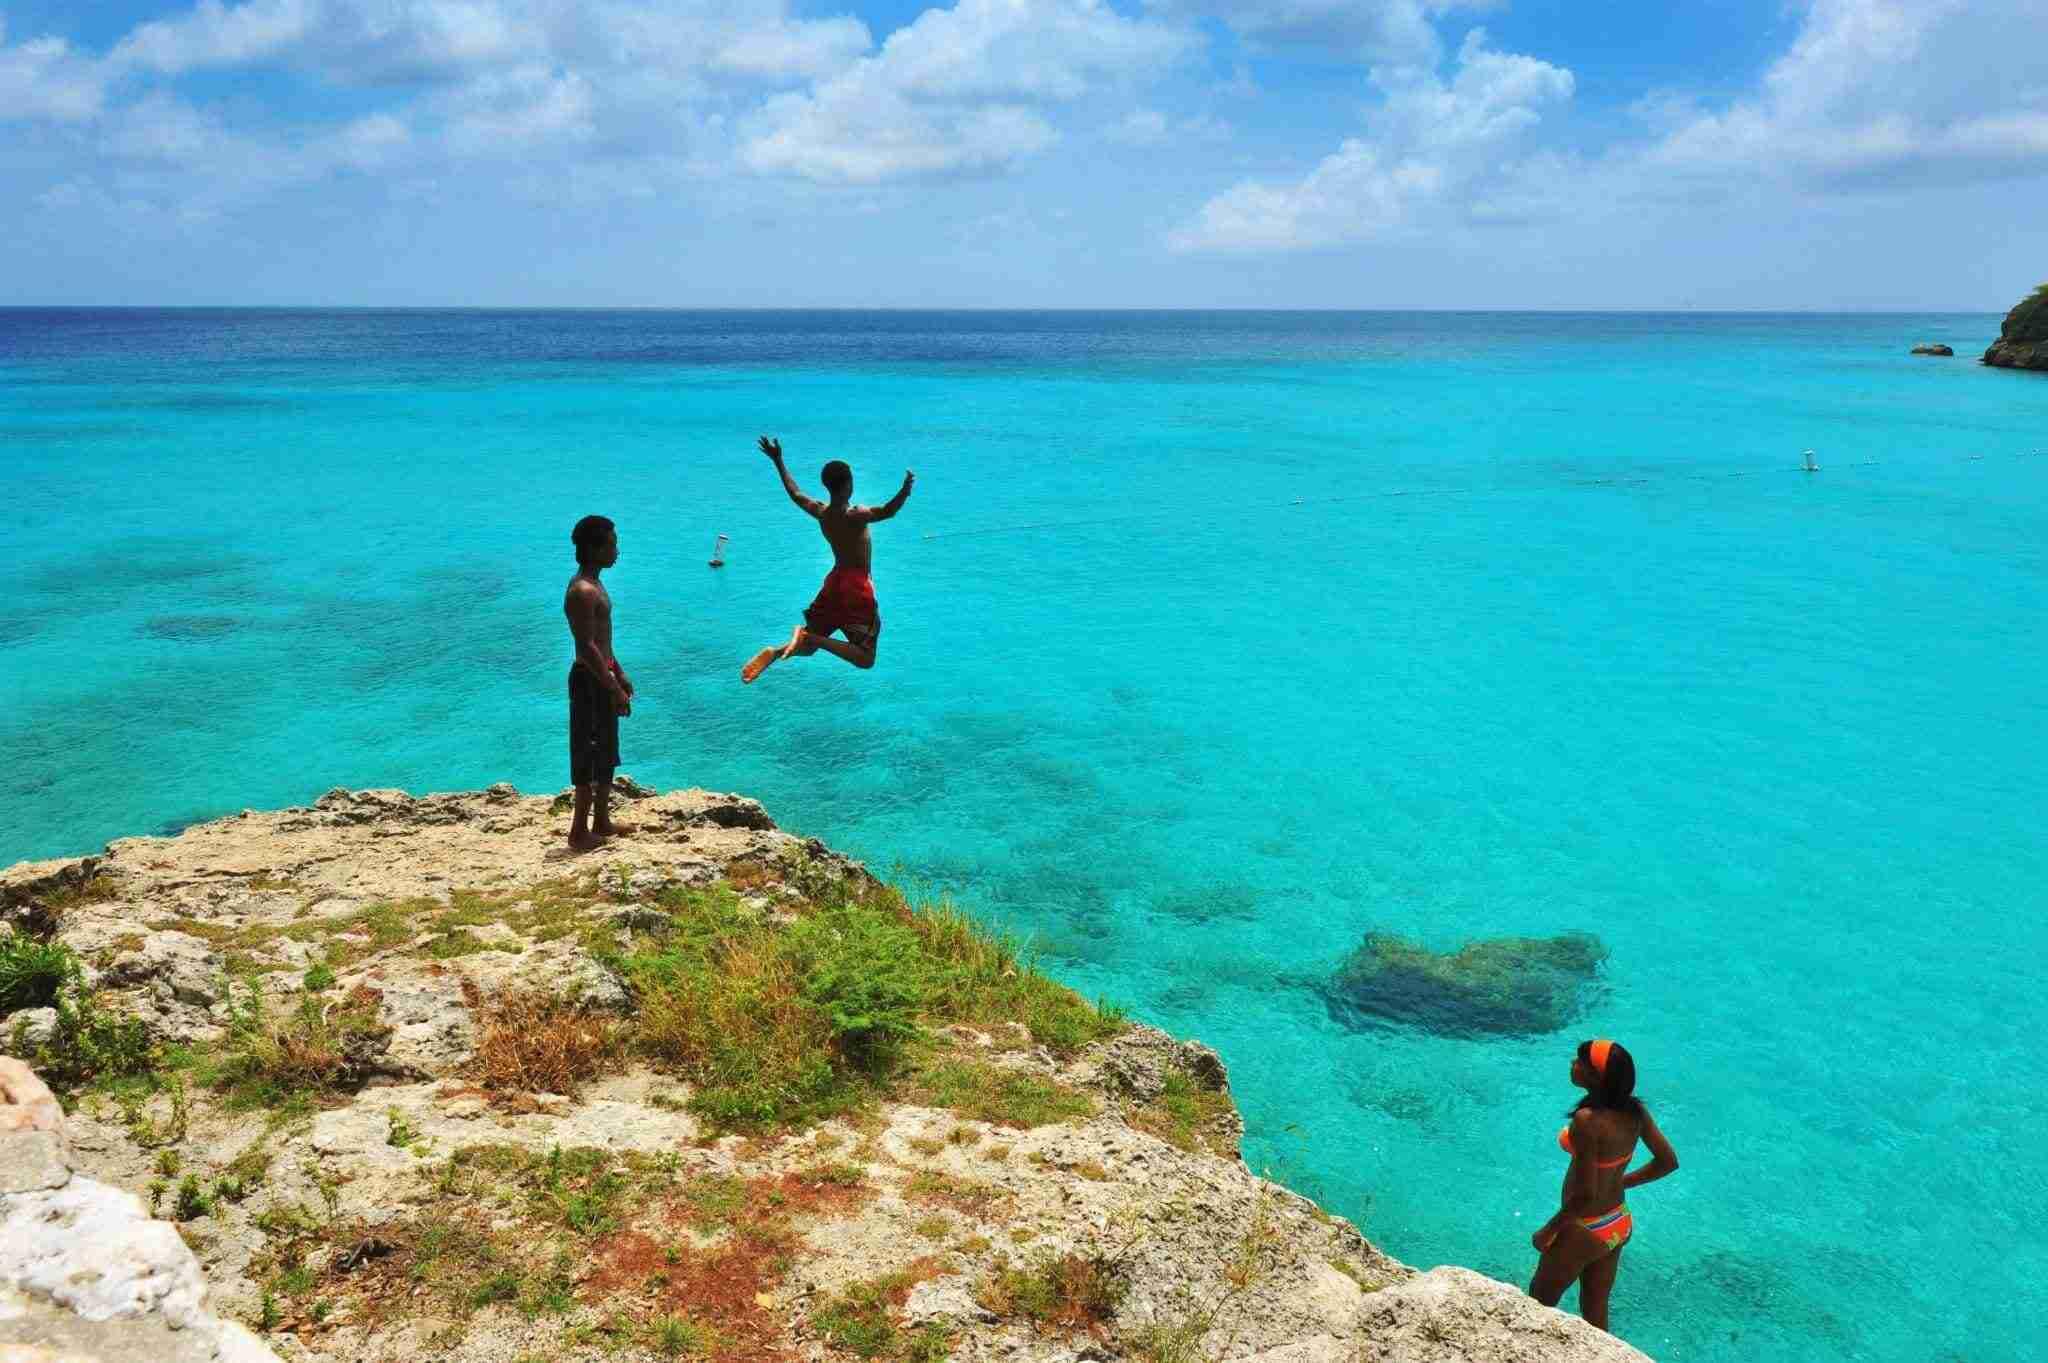 Kenepa Plantation | Episode 9 | Postcards from Curaçao